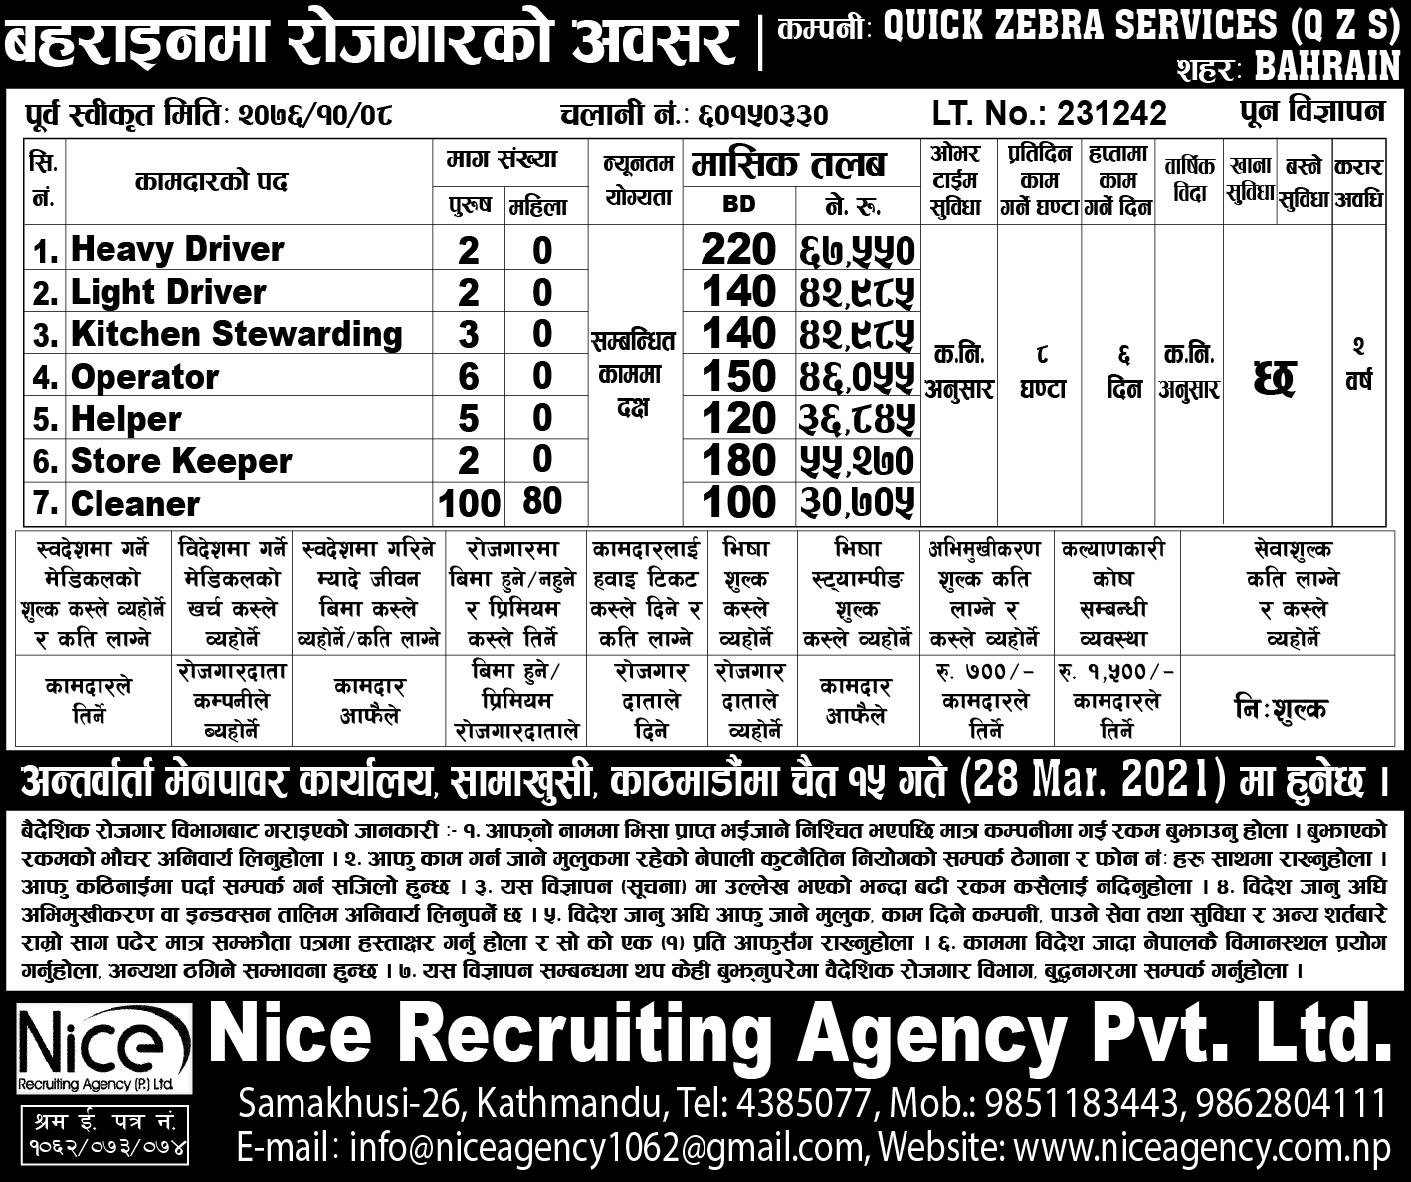 Jobs in Bahrain for Nepali